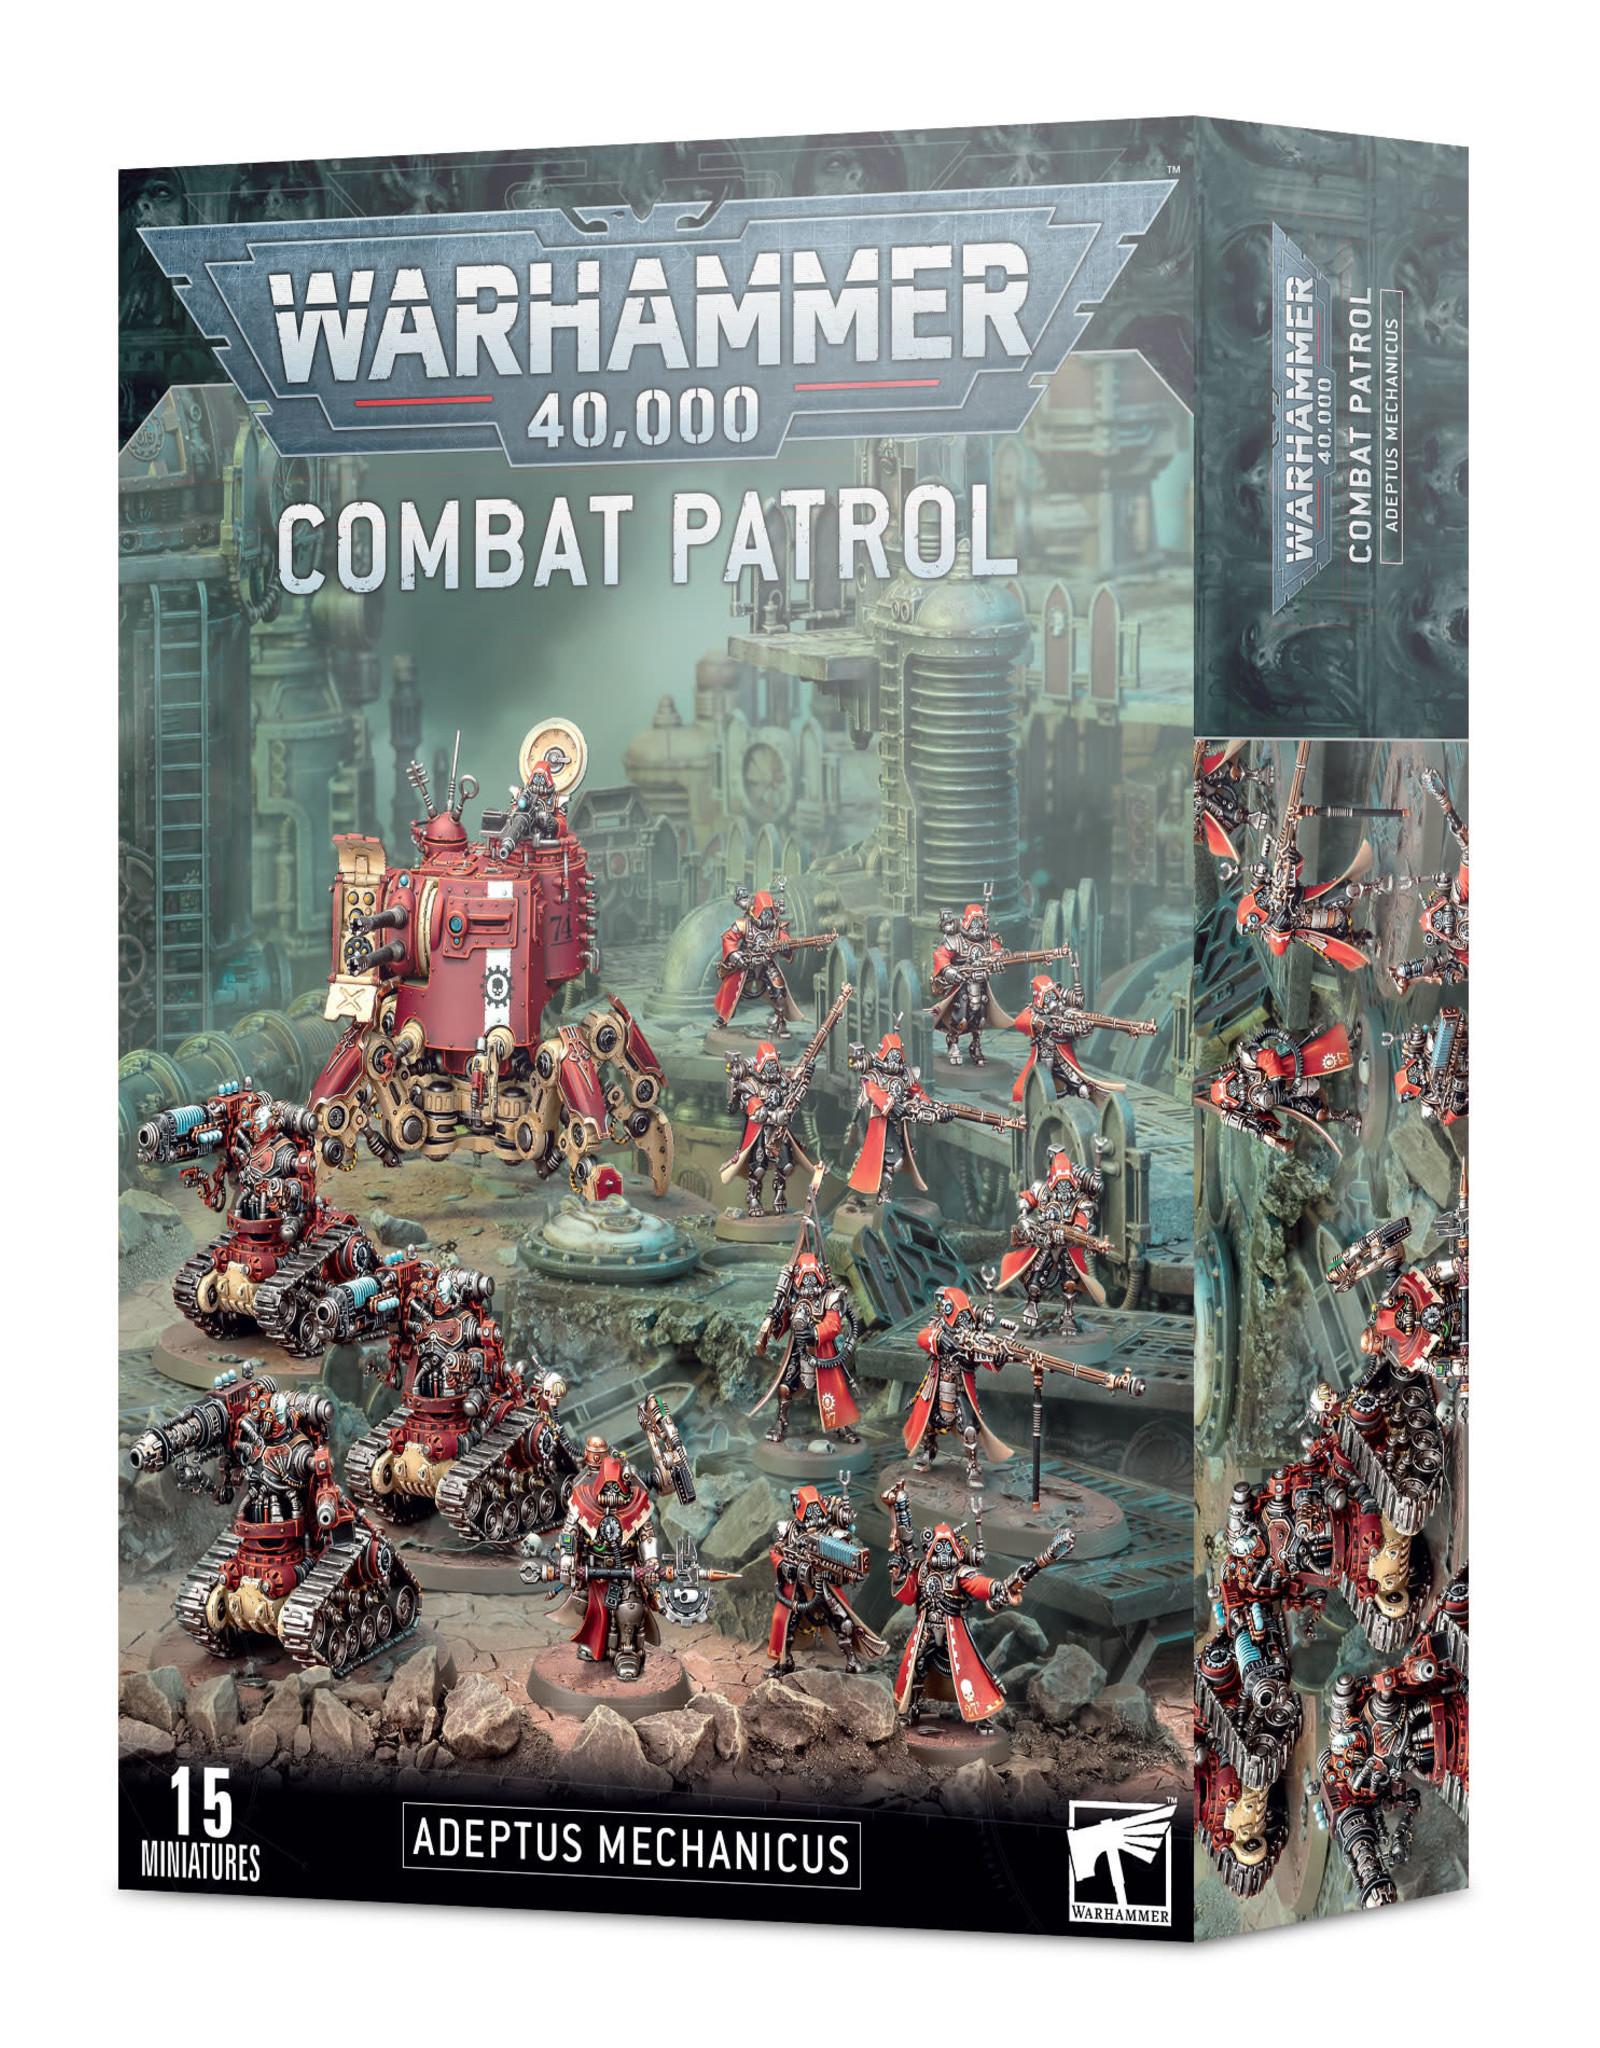 Games Workshop Warhammer 40K Combat Patrol Adeptus Mechanicus